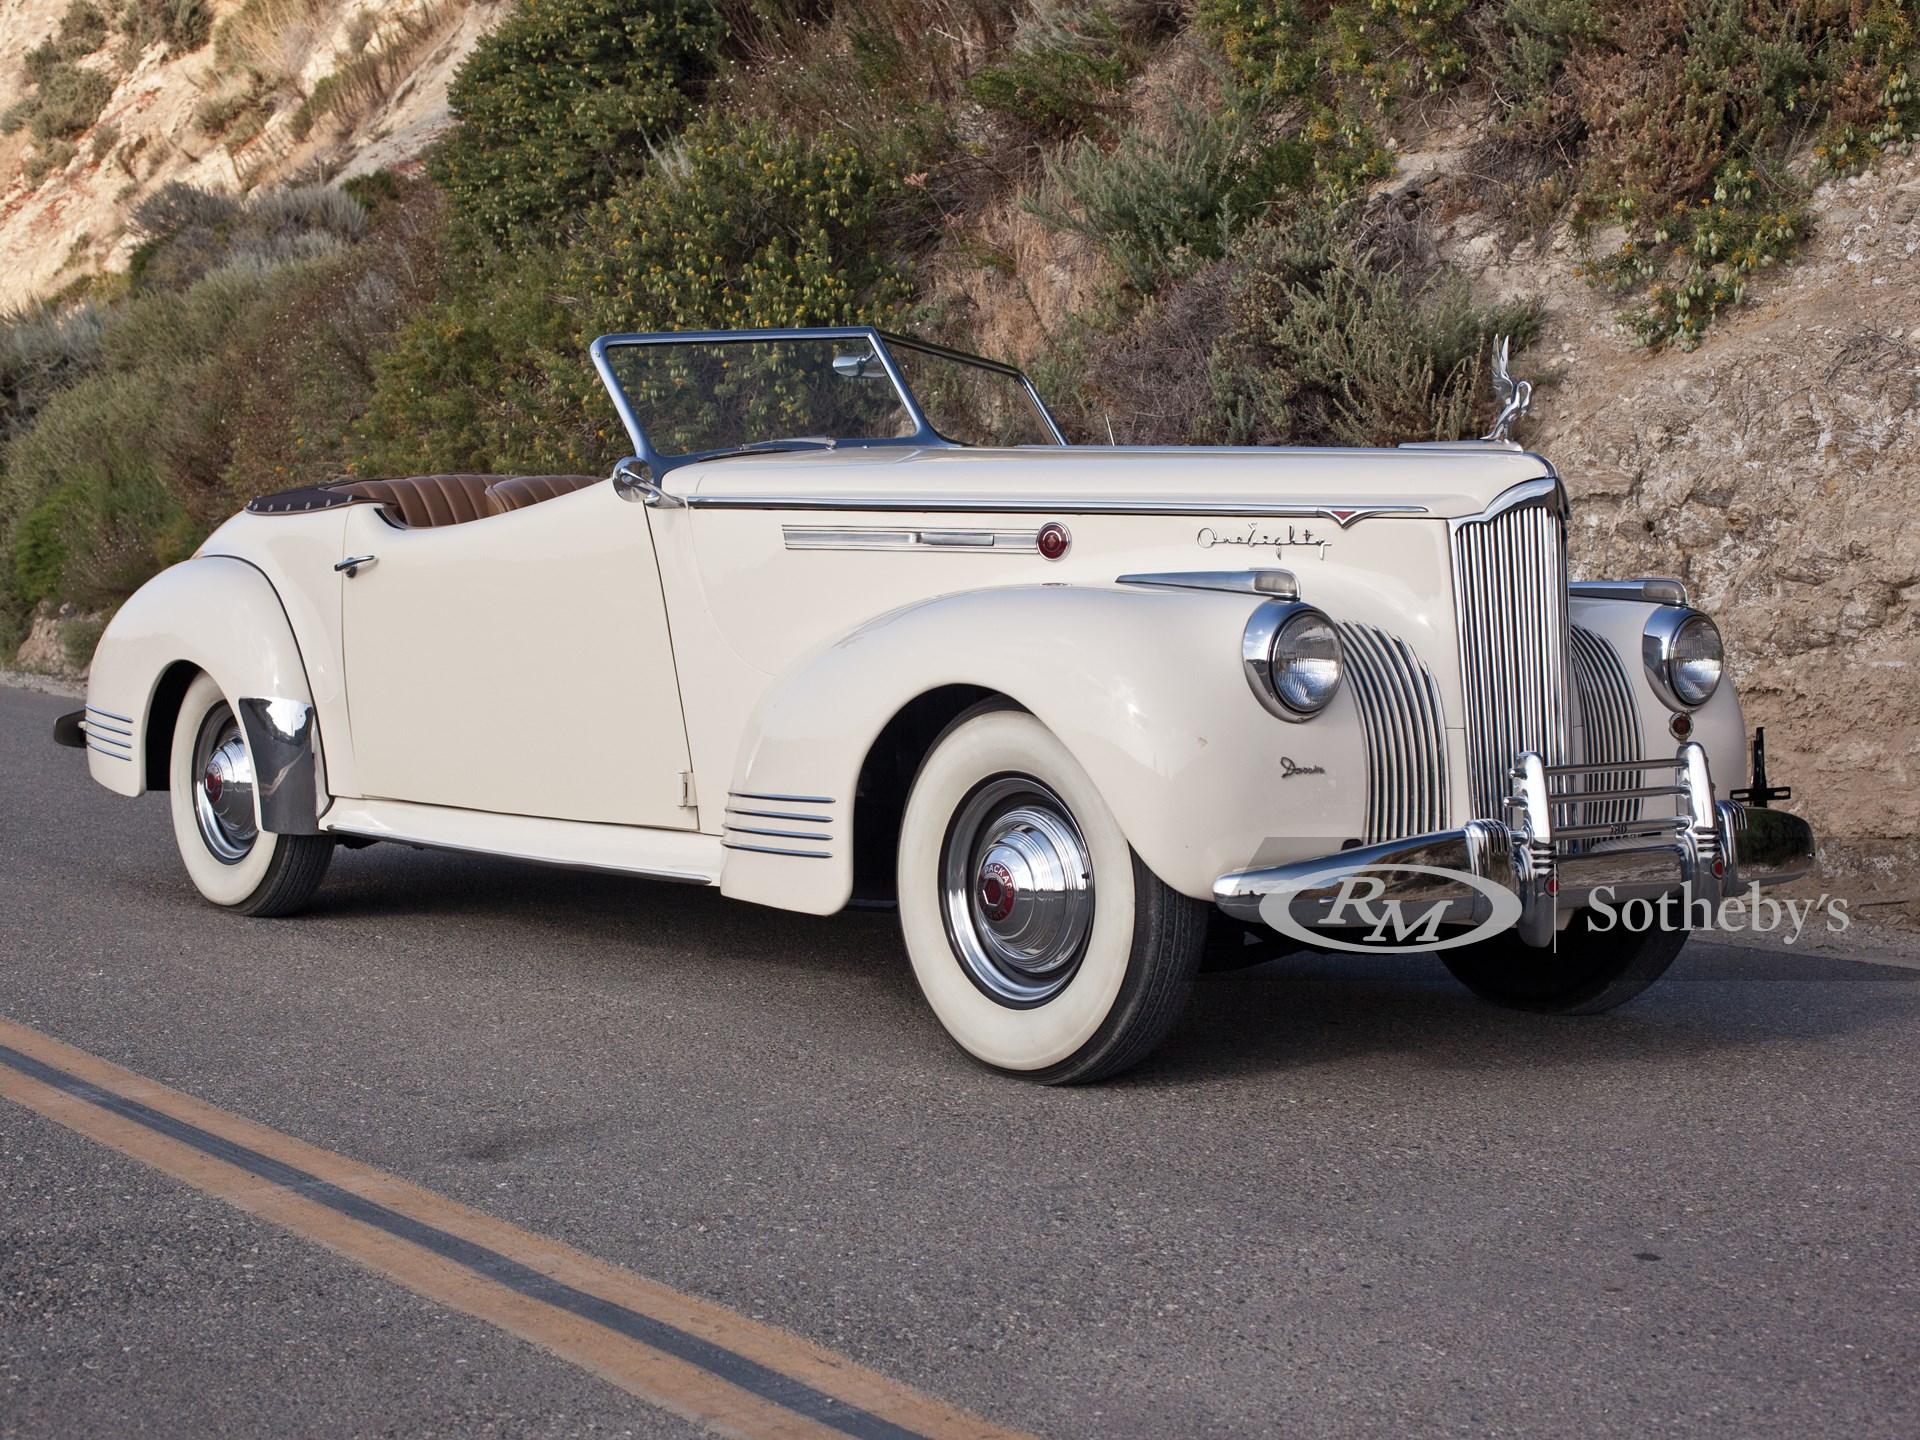 1941 Packard Super Eight Darrin Convertible Victoria